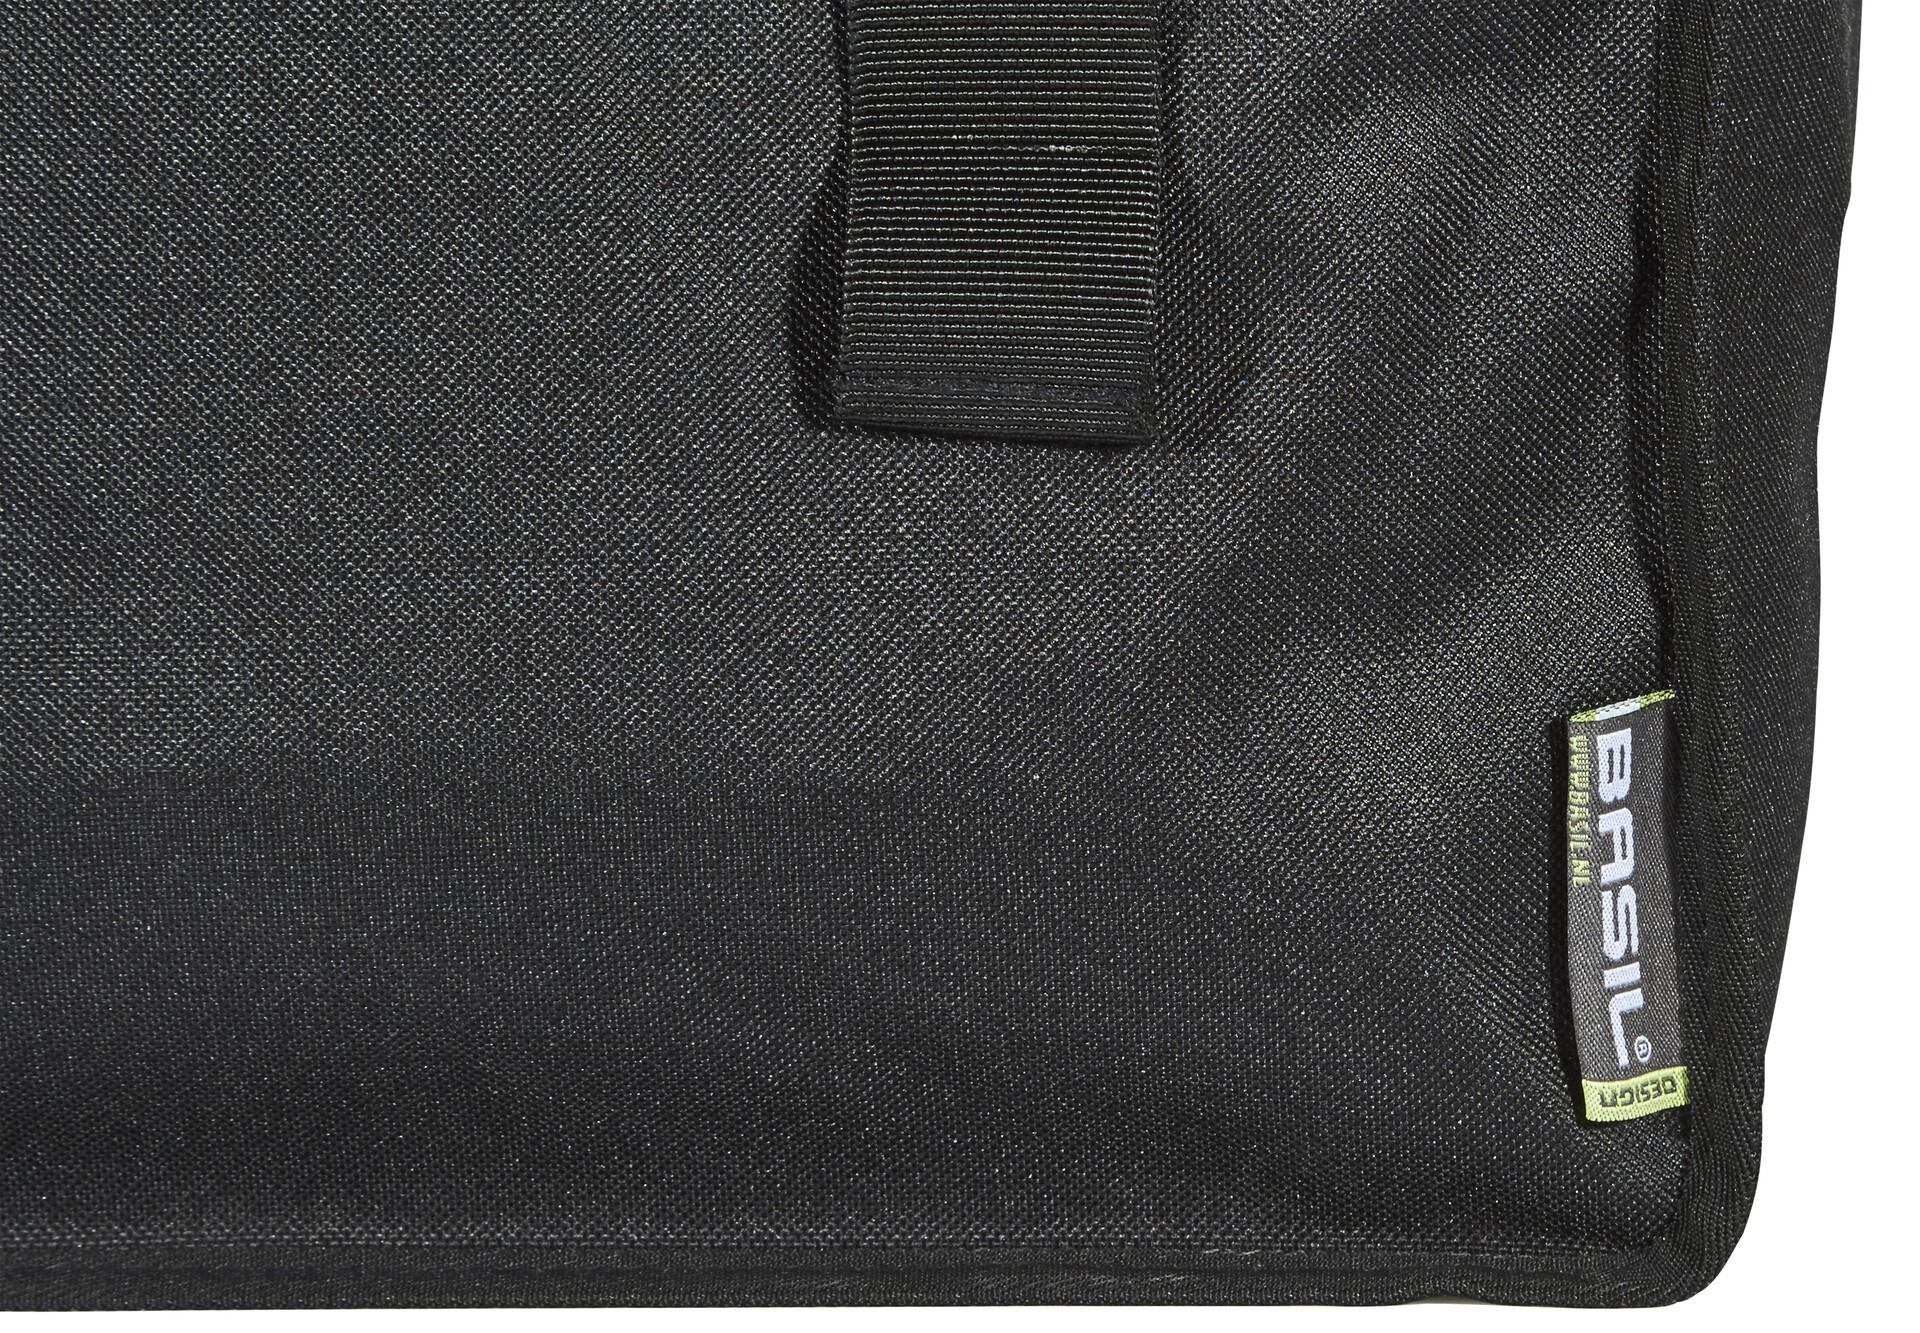 Basil Mara Tupla tavaratelinelaukku 3XL, 52l, black